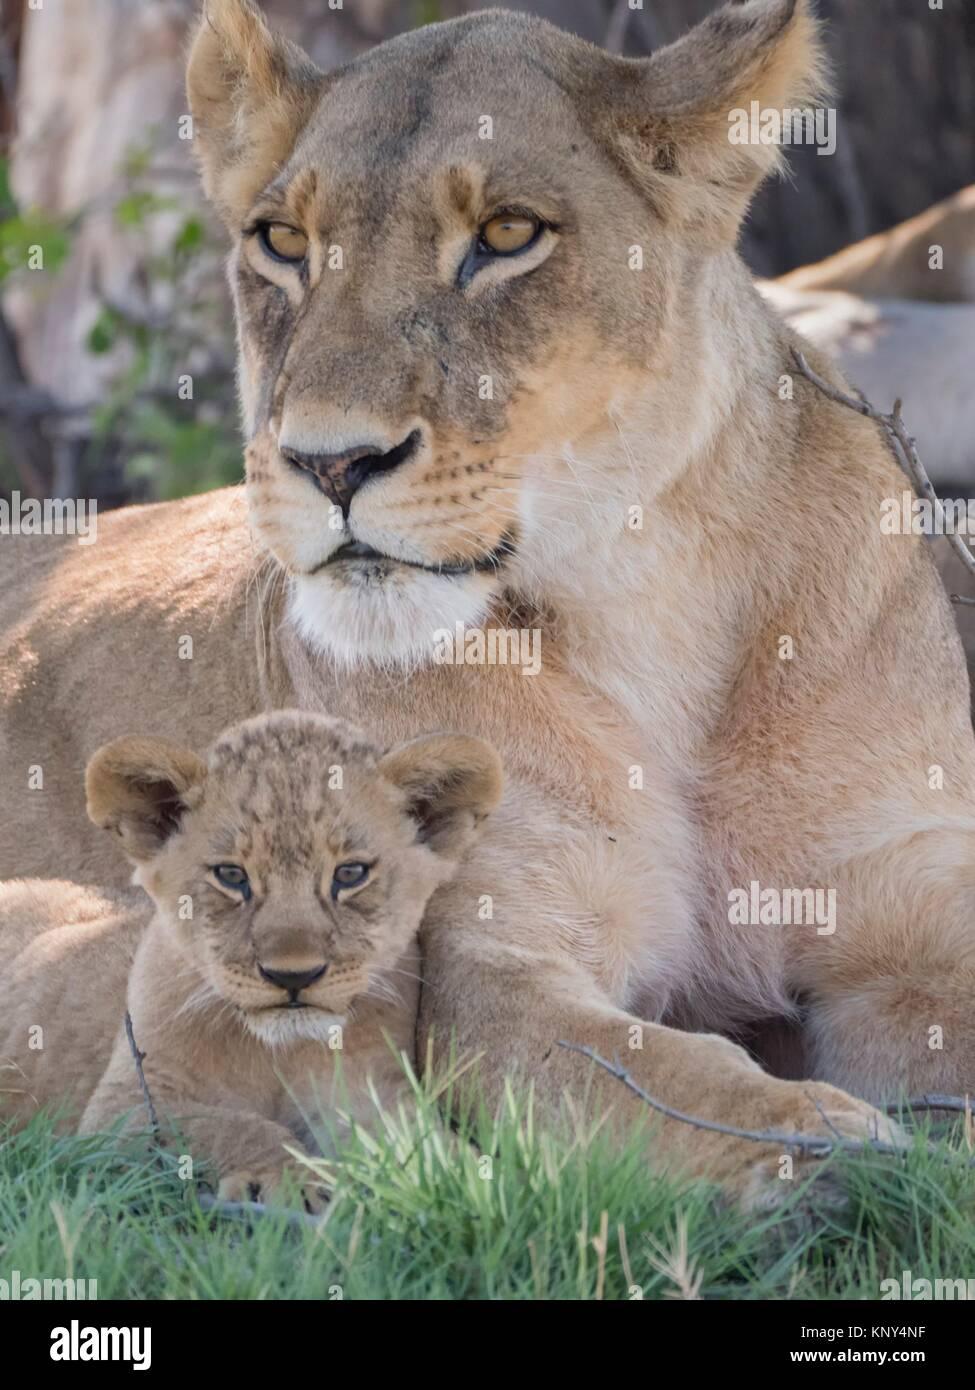 Botswana. Löwin und Baby. Stockbild